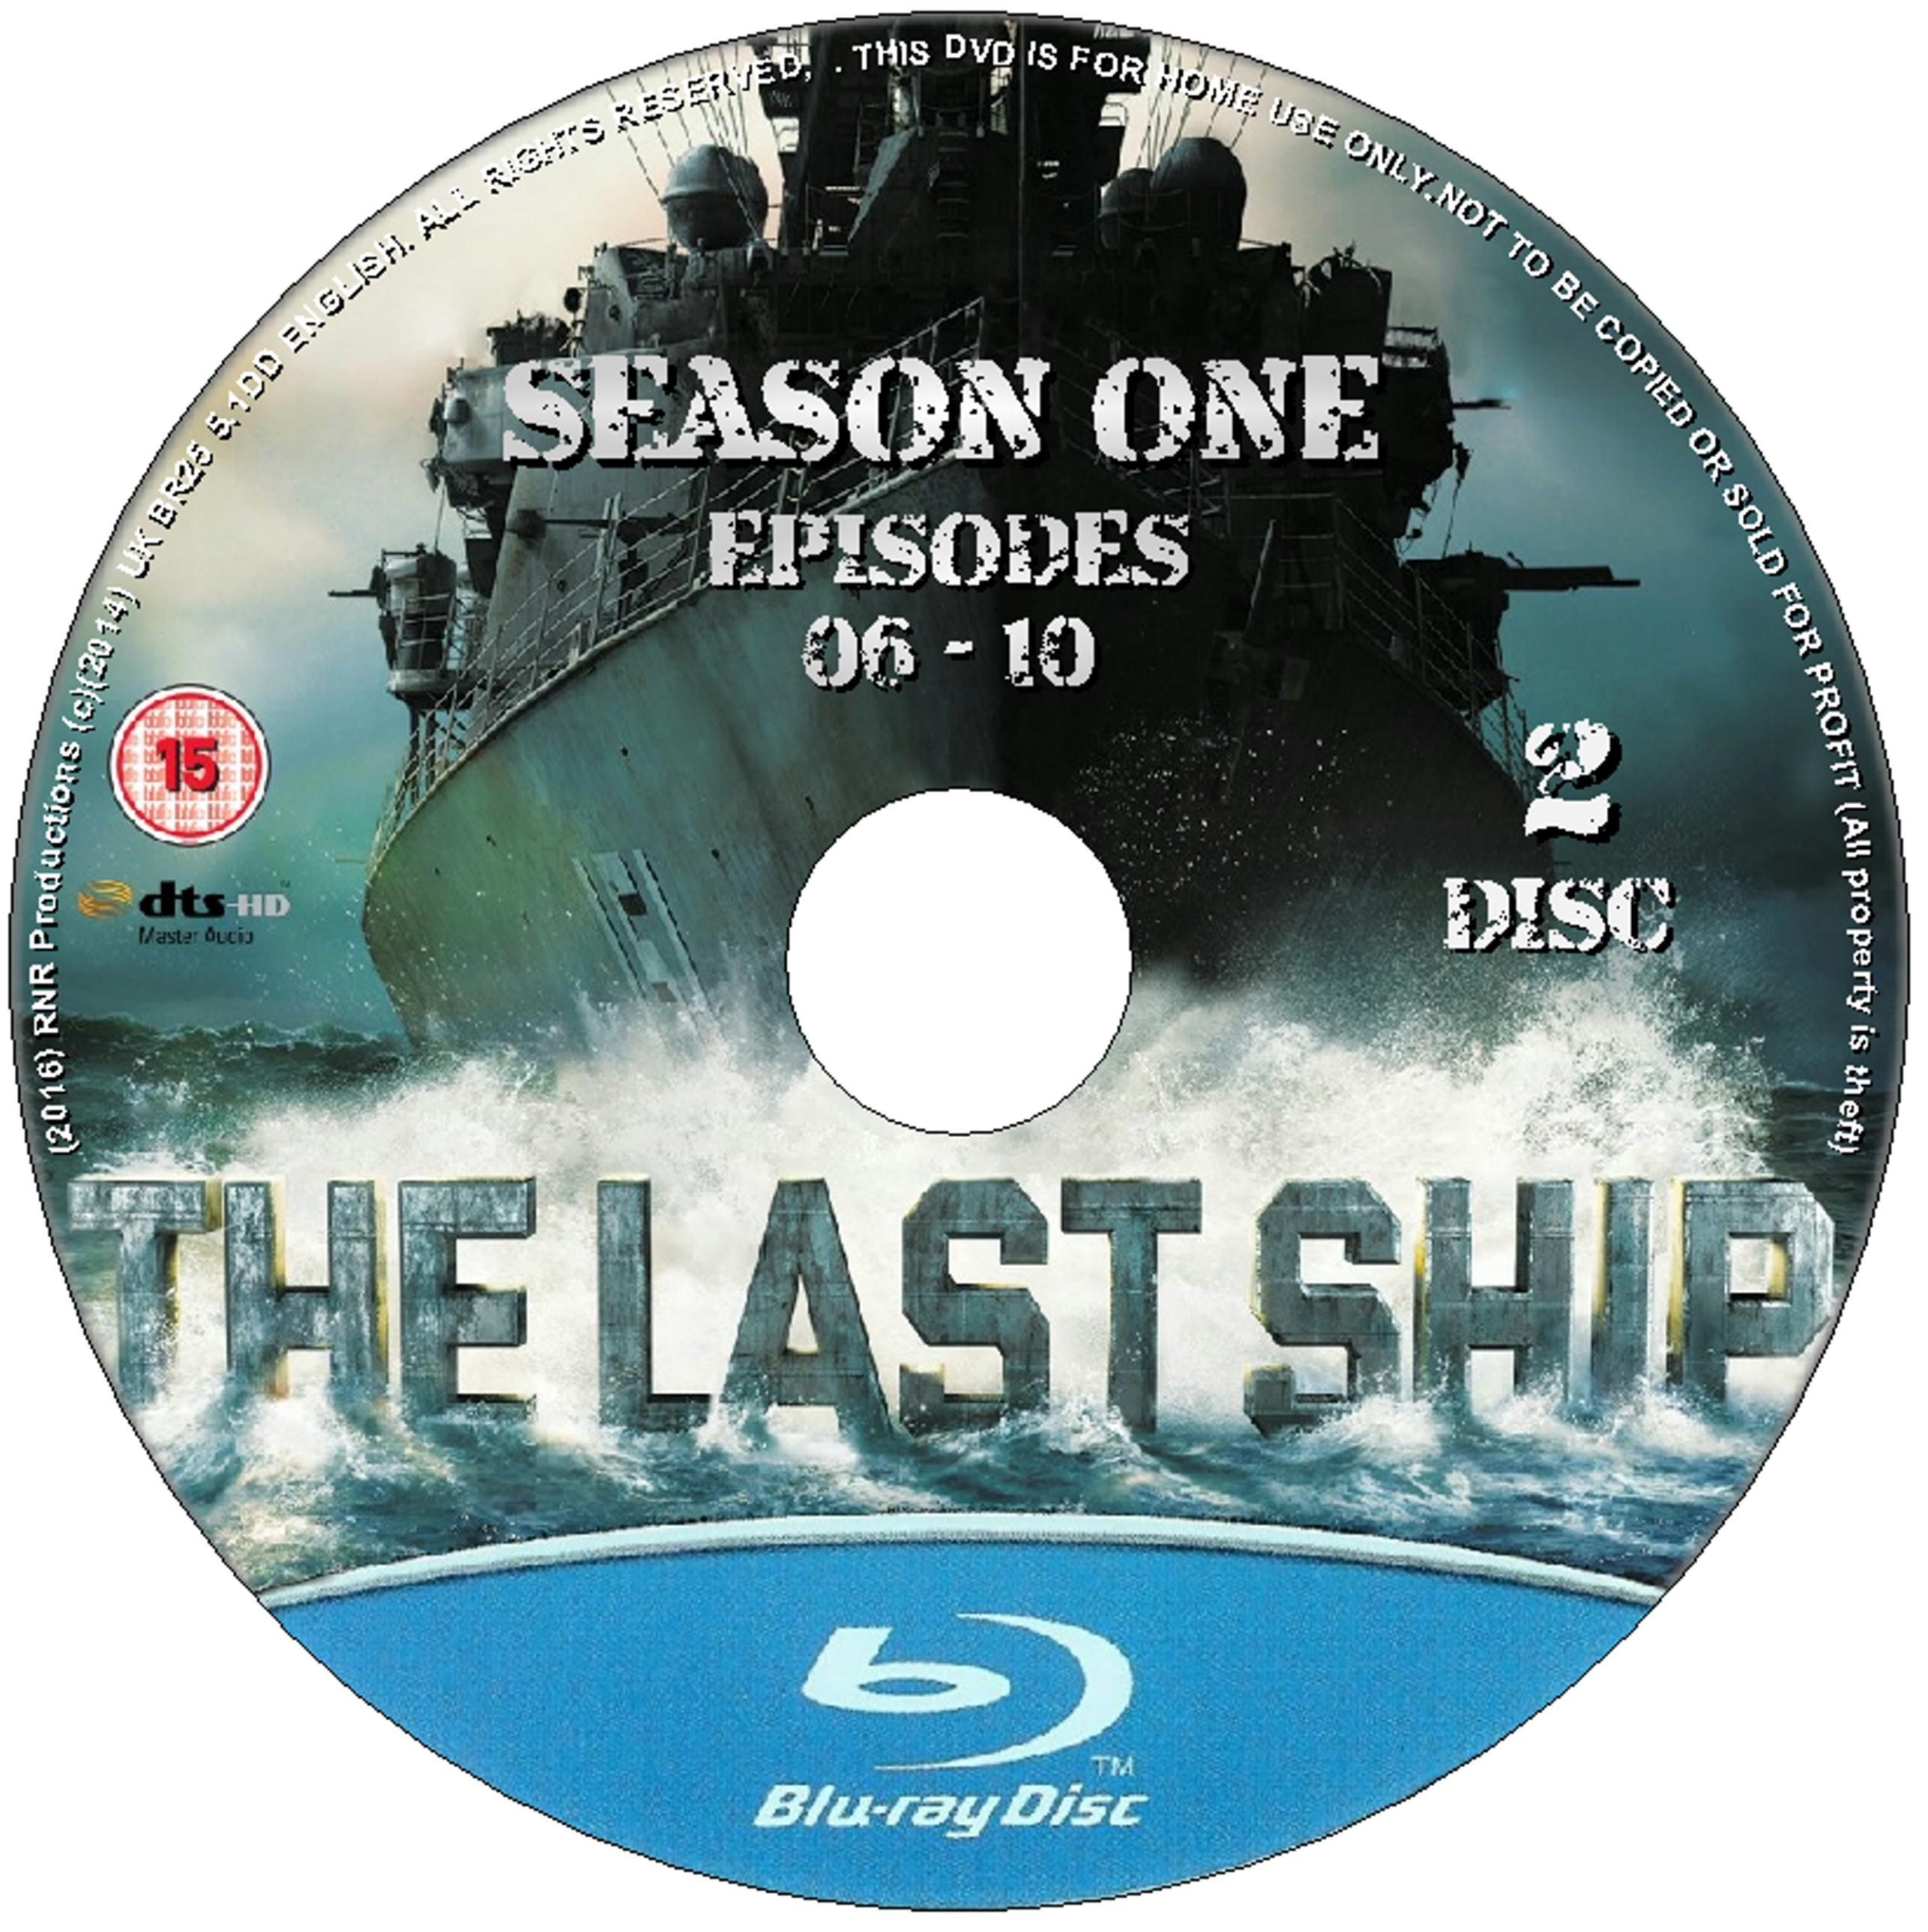 Catch-22 dvd Season 1